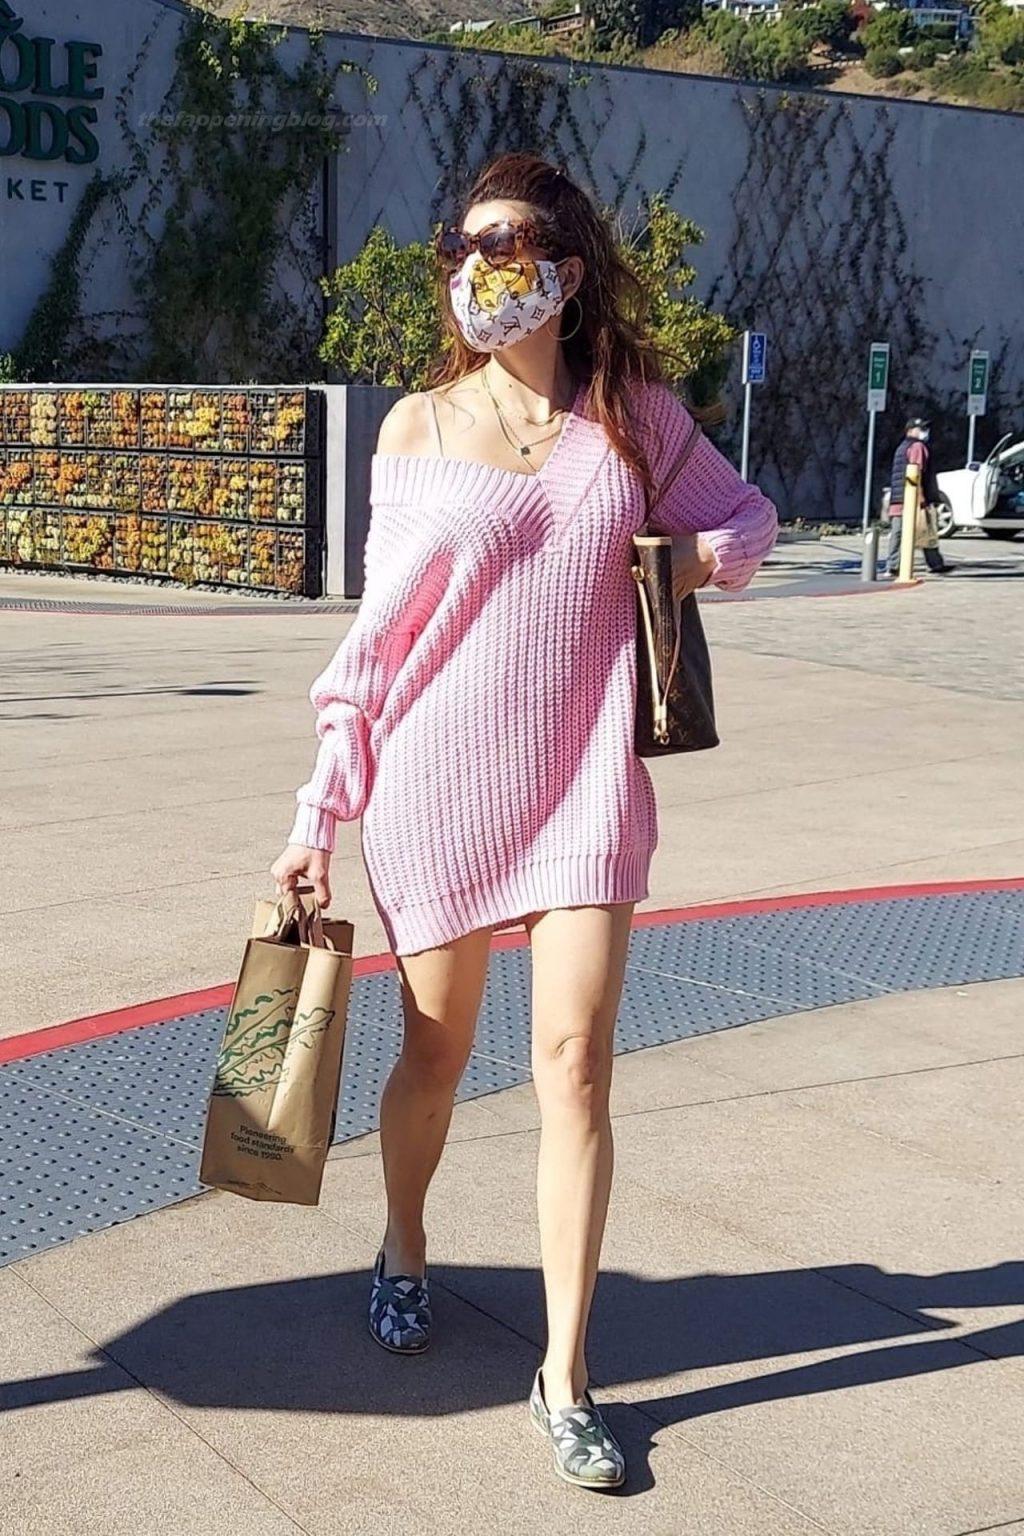 Leggy Blanca Blanco Kicks Back After Grocery Shopping in Malibu (15 Photos)